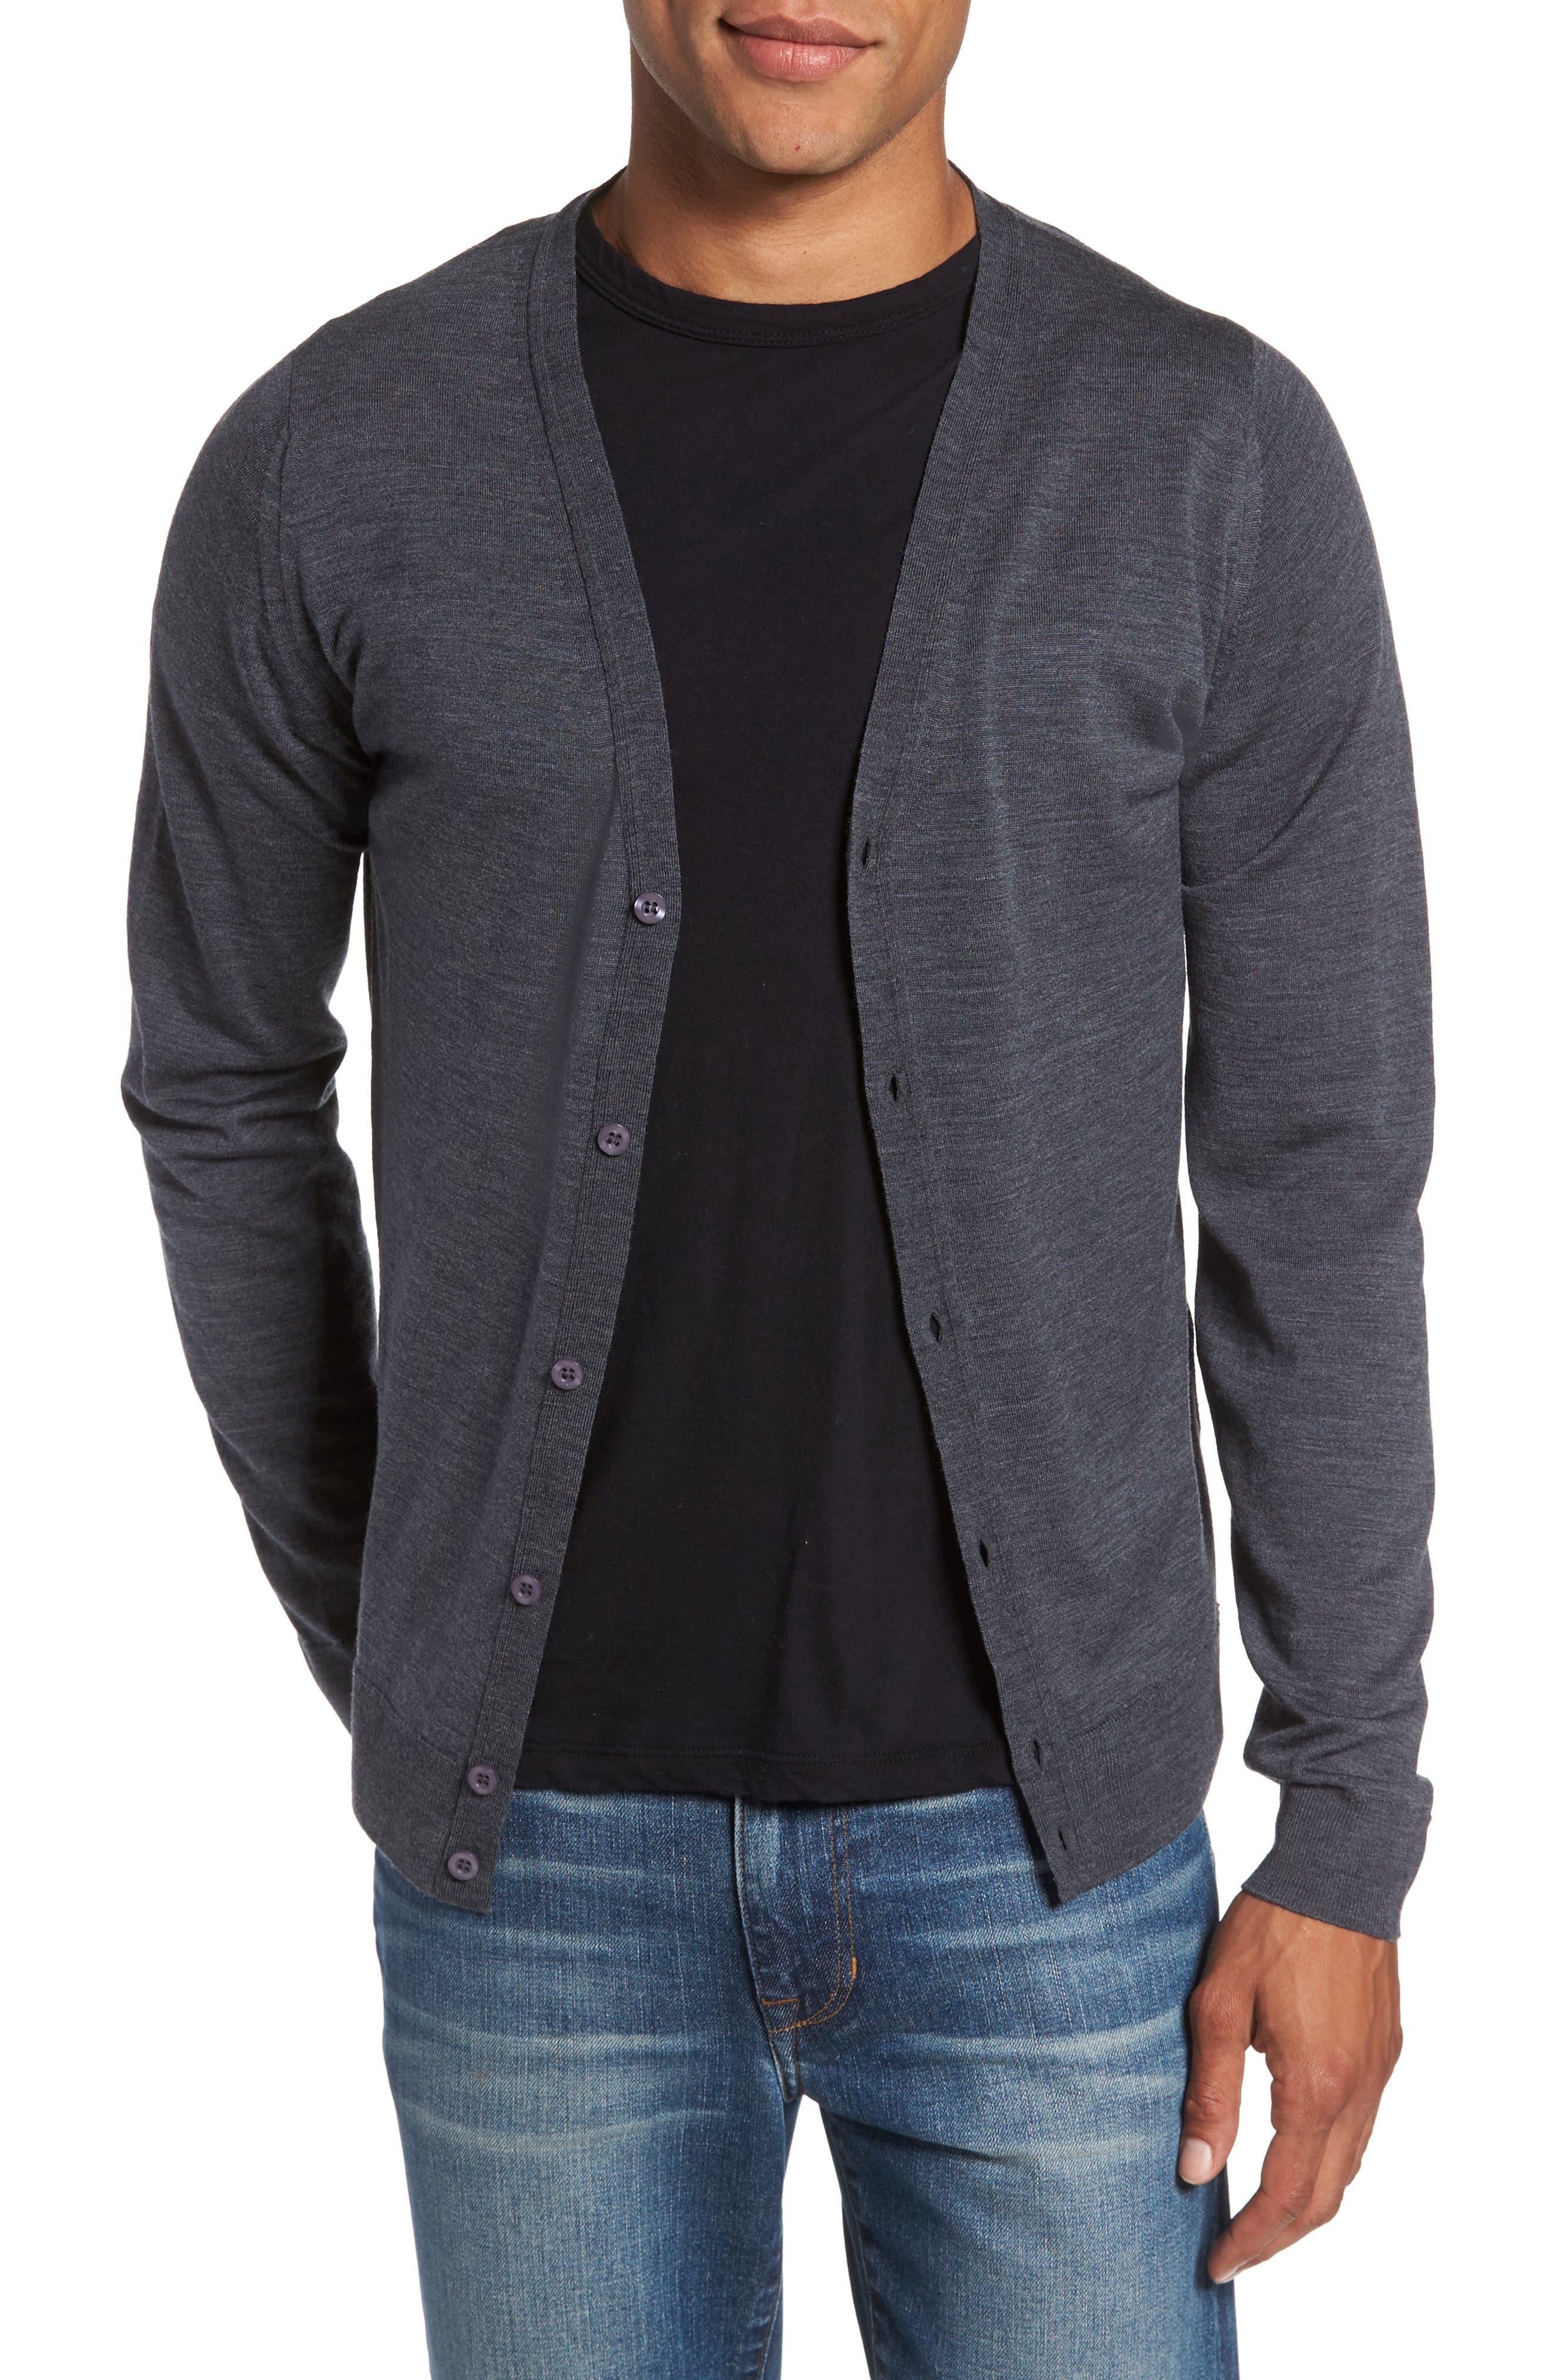 Main Image - John Smedley Standard Fit Wool Cardigan